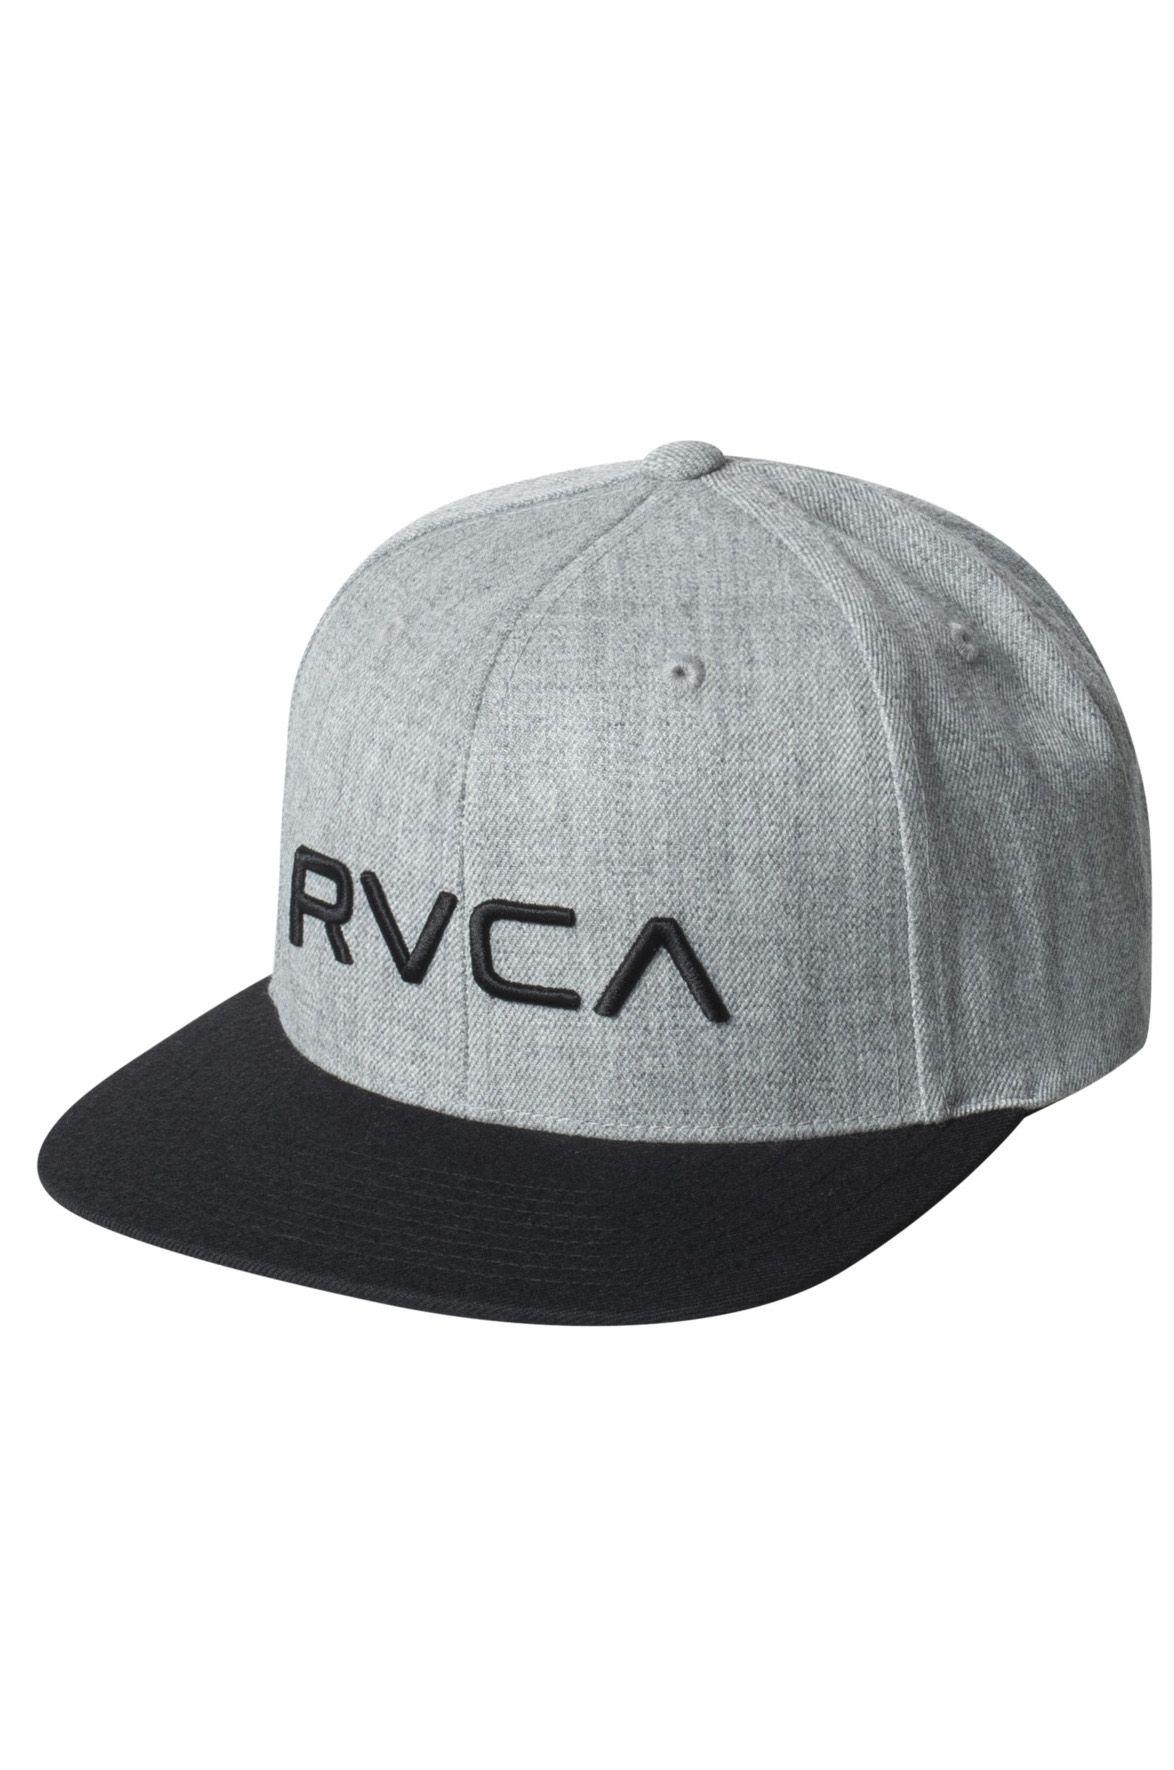 Bone RVCA RVCA TWILL SNAPBACK Hthr Grey/Black